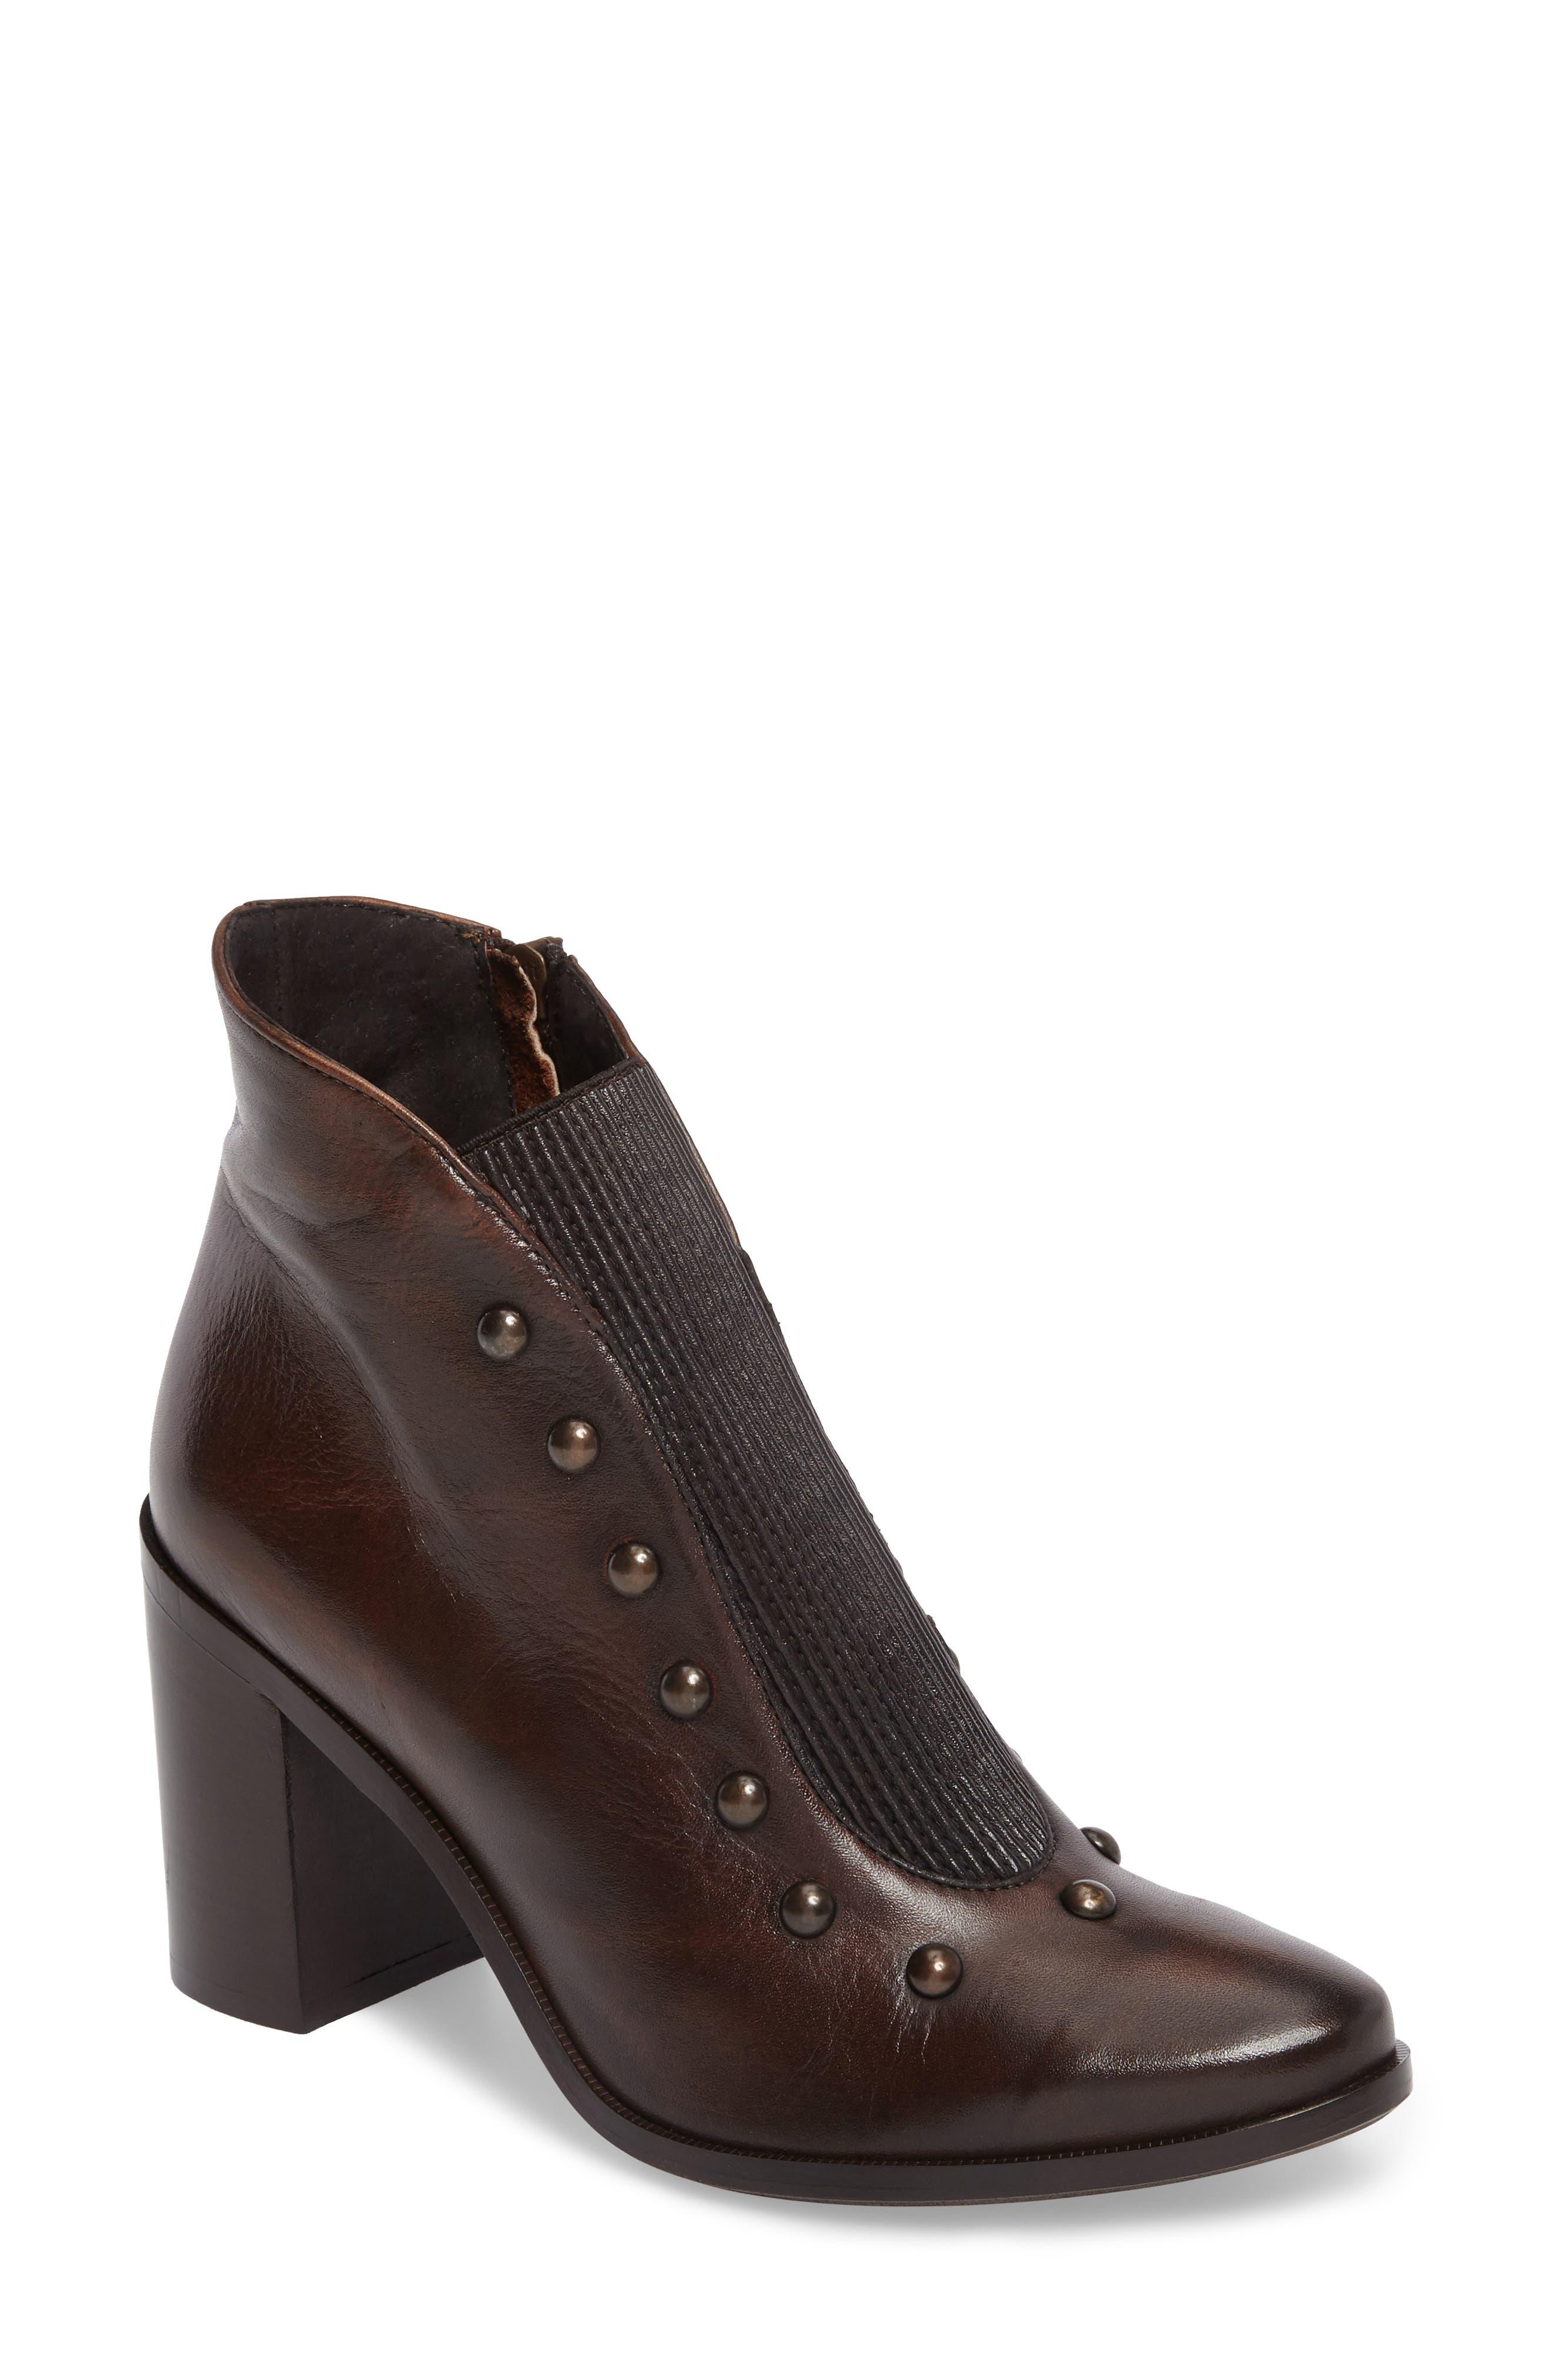 Beatrix Studded Bootie,                         Main,                         color, Deer Leather